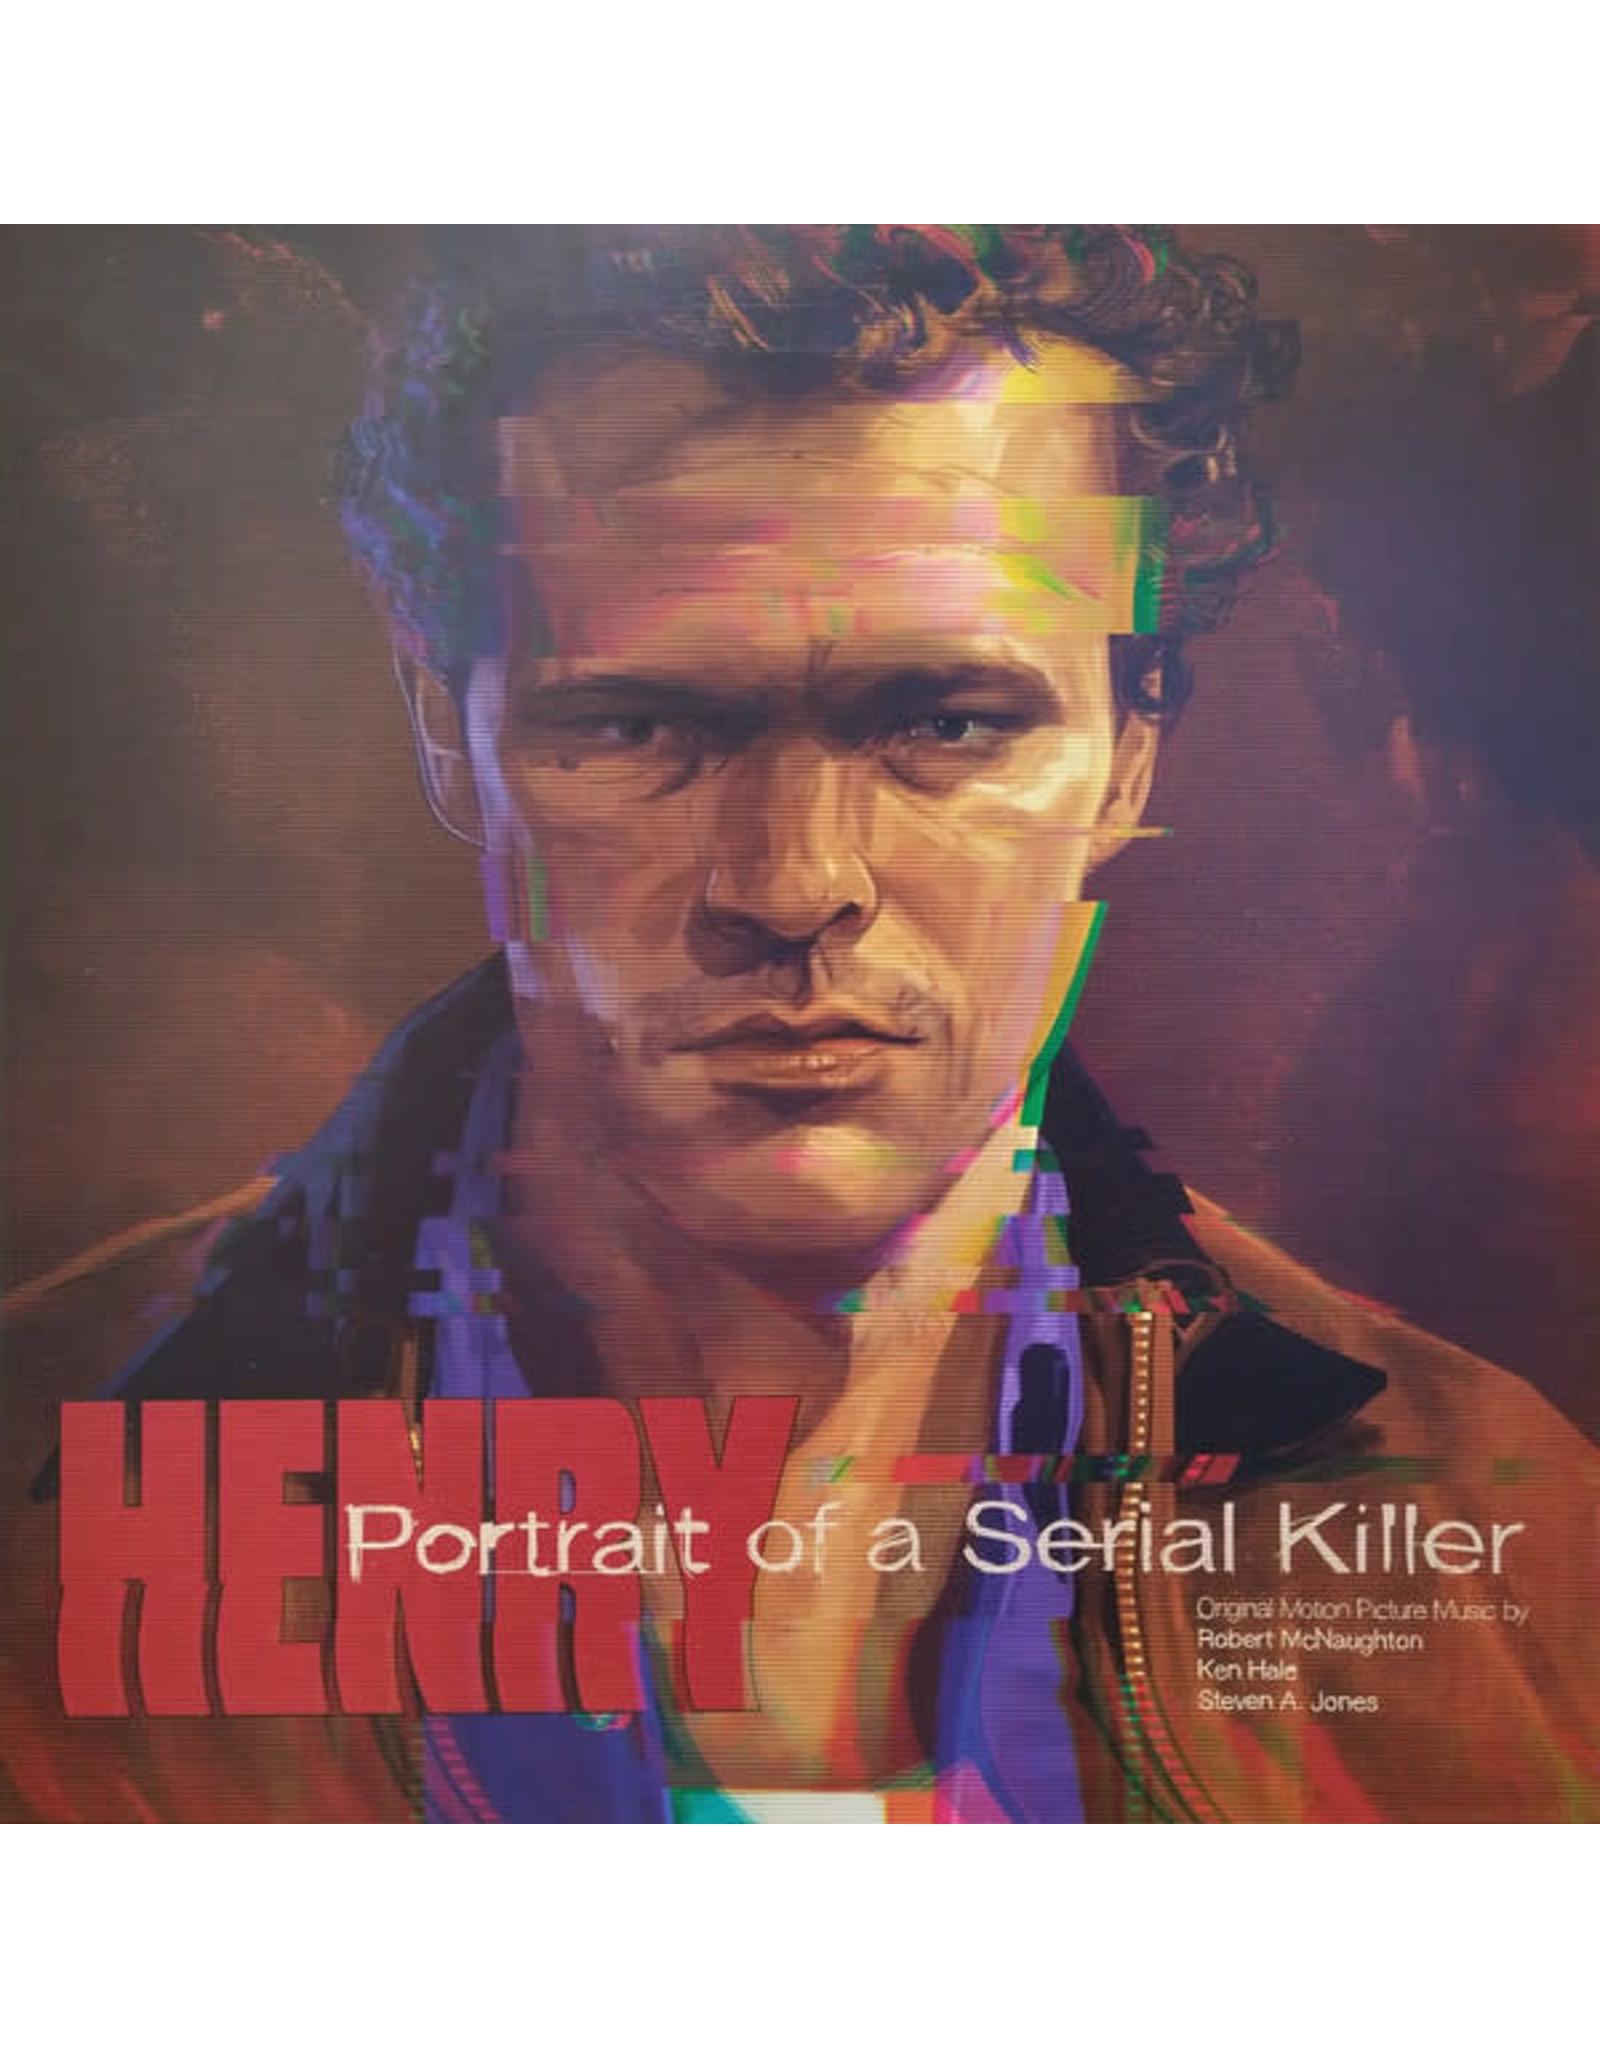 New Vinyl Robert McNaughton, Ken Hale, Steven A. Jones – Henry: Portrait Of A Serial Killer OST (Colored) LP